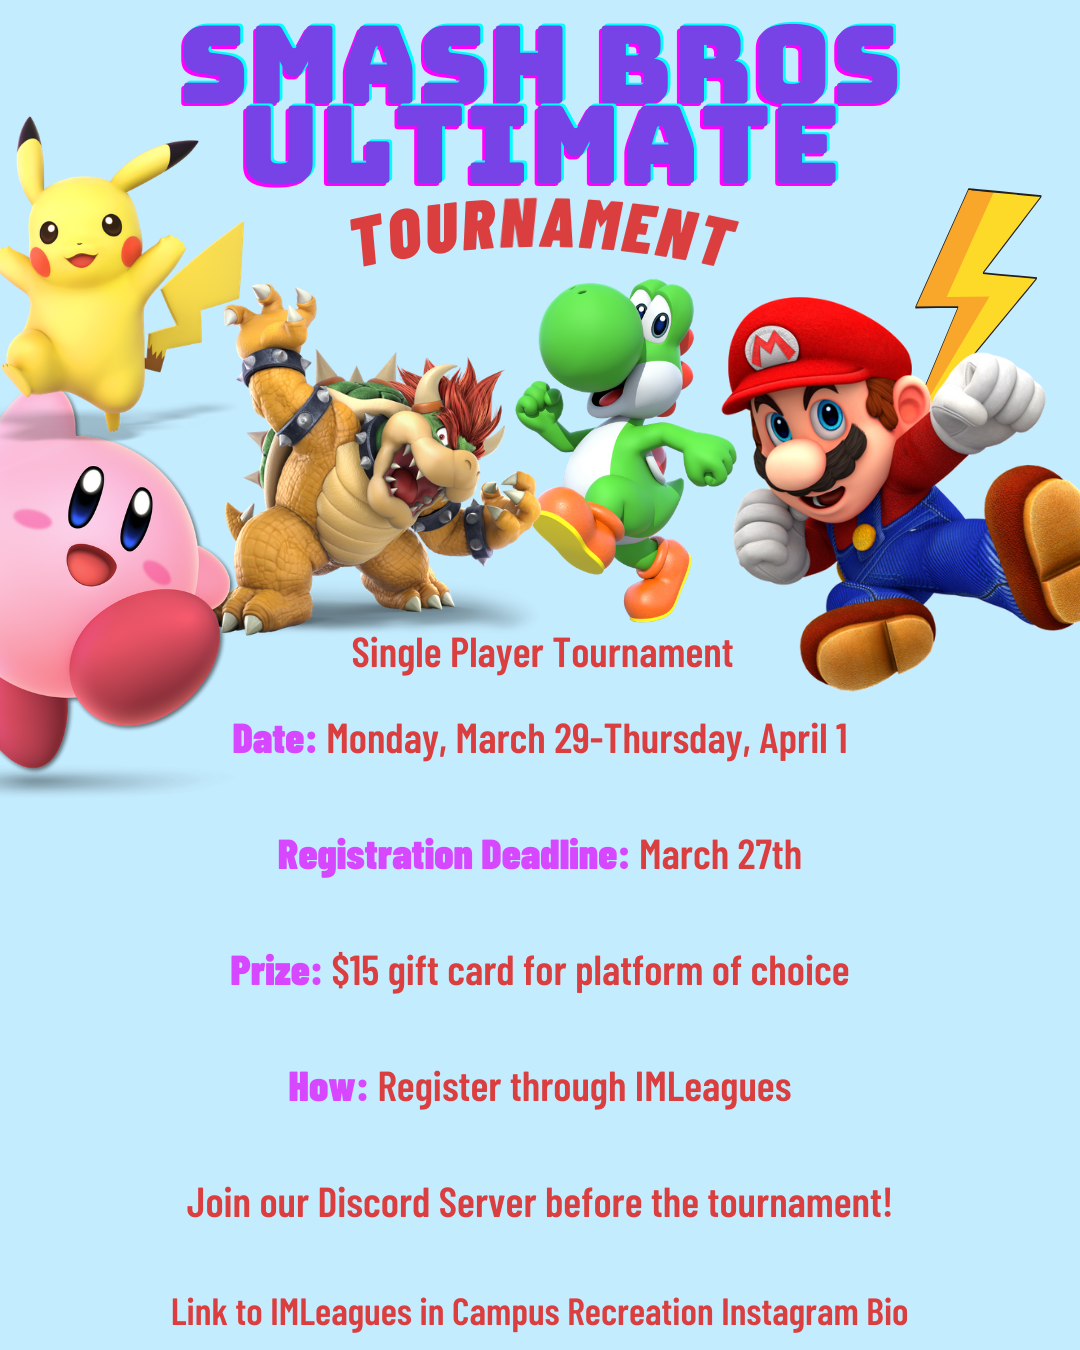 Smash Bros Ultimate tournament flyer